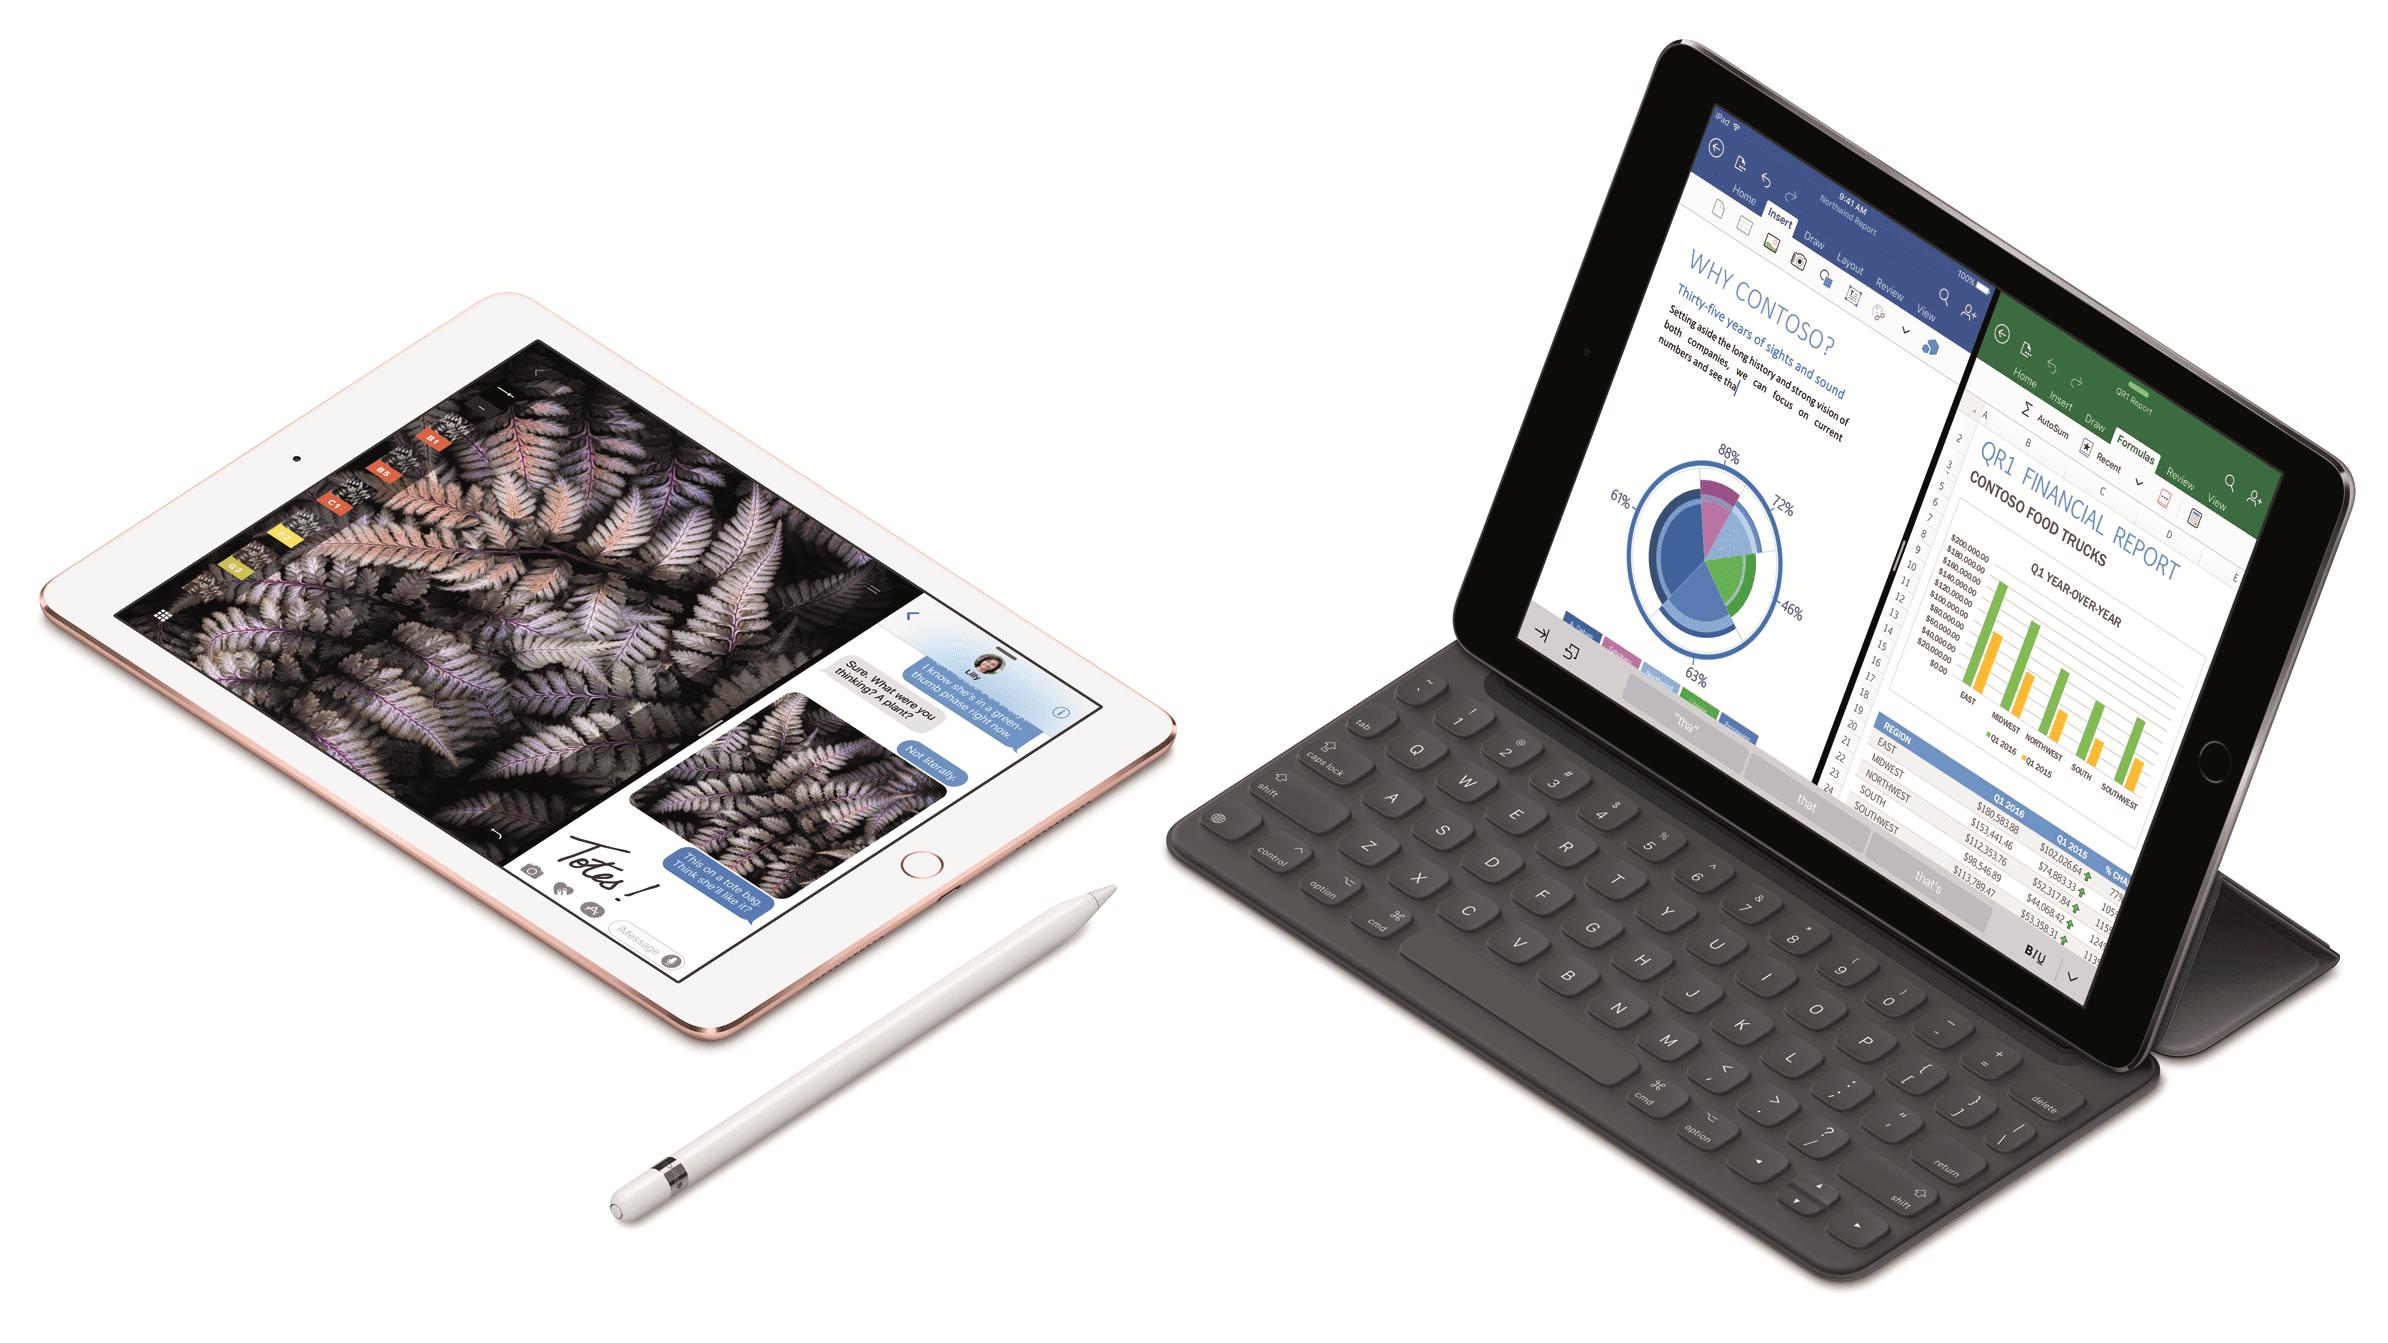 iPad Comparison Chart: Compare All Models of the iPad